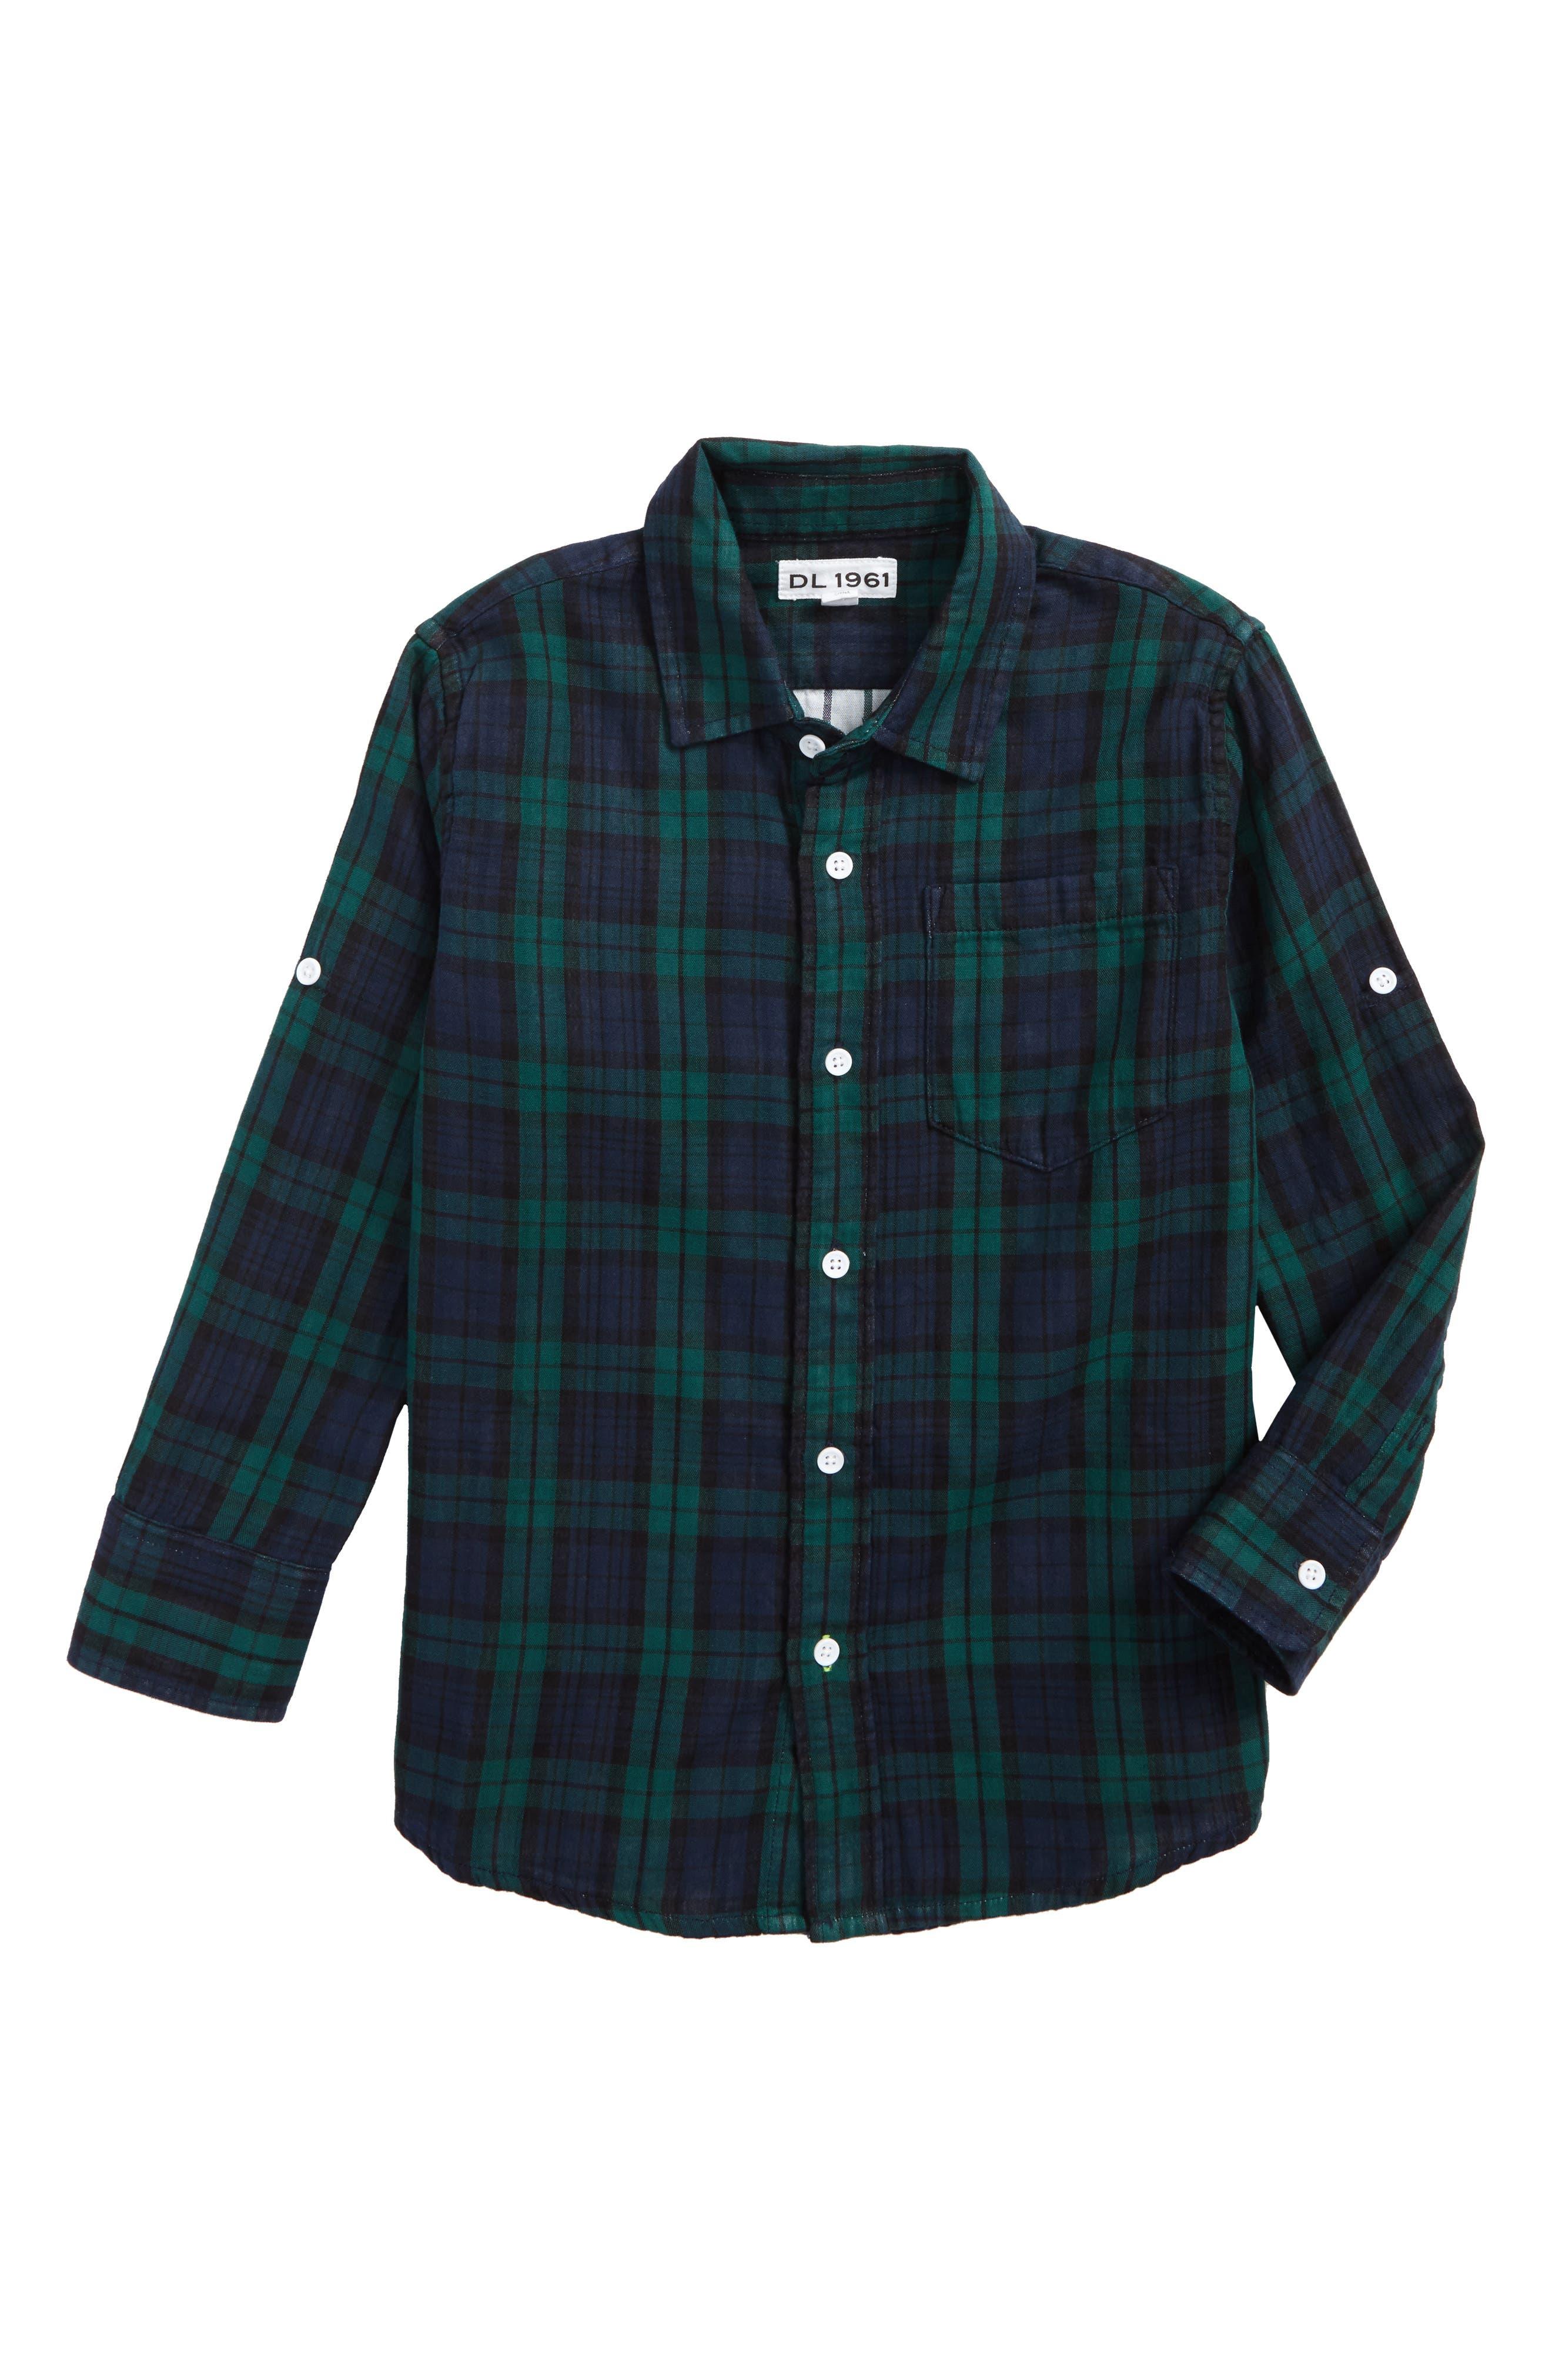 Plaid Woven Shirt,                         Main,                         color, Green Double Faced Plaid